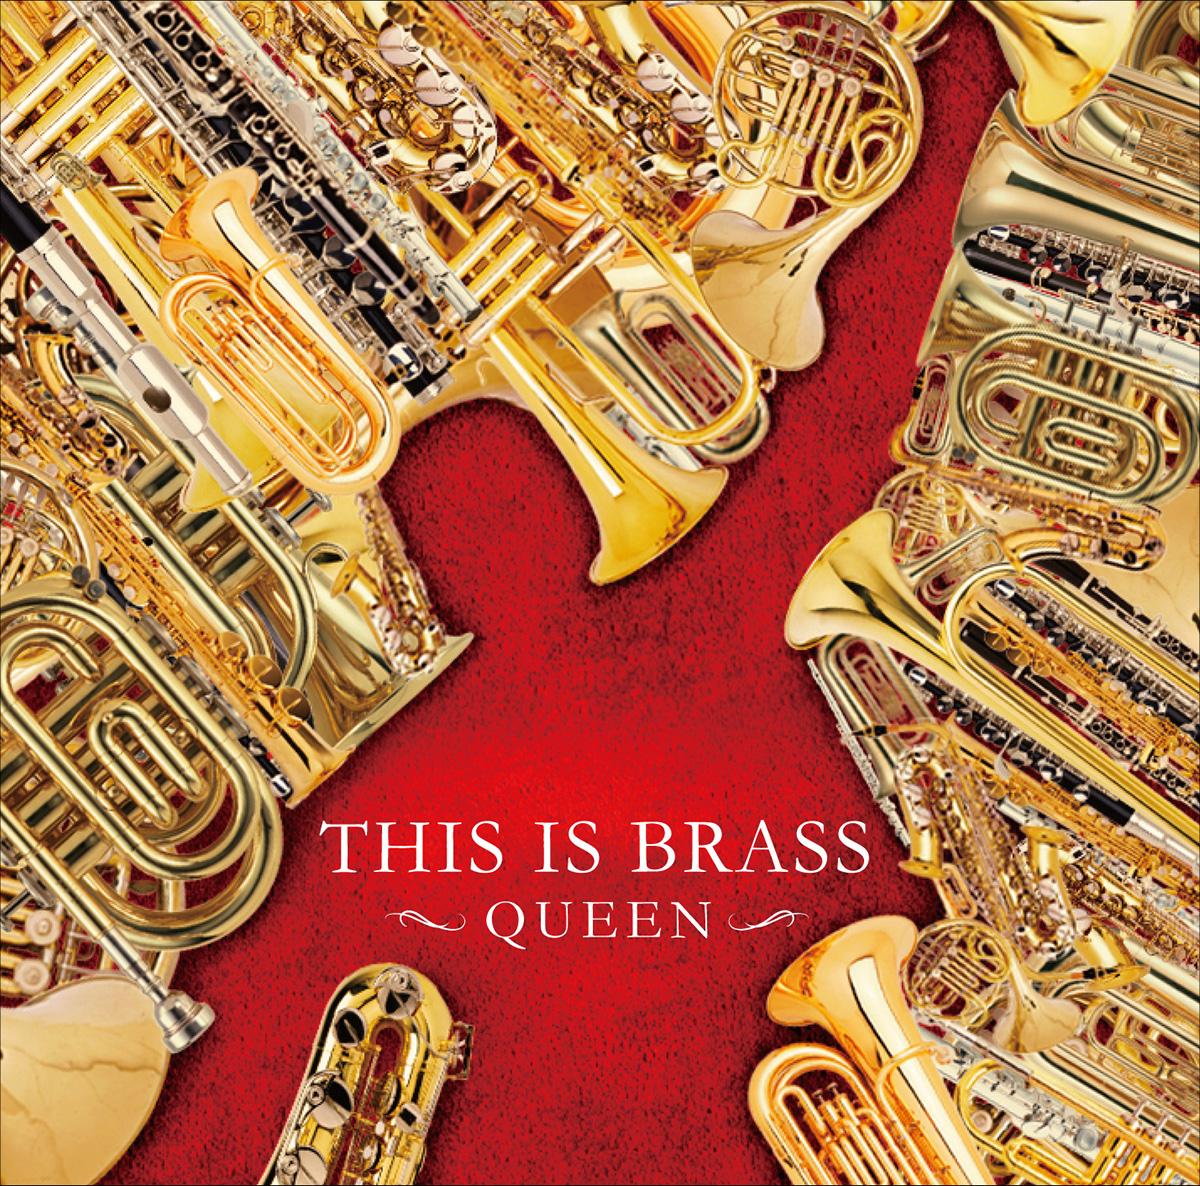 Queen の美しき音楽世界を吹奏楽でカバー This Is Brass ブラバン Queen 発売 ユニバーサル ミュージック合同会社のプレスリリース